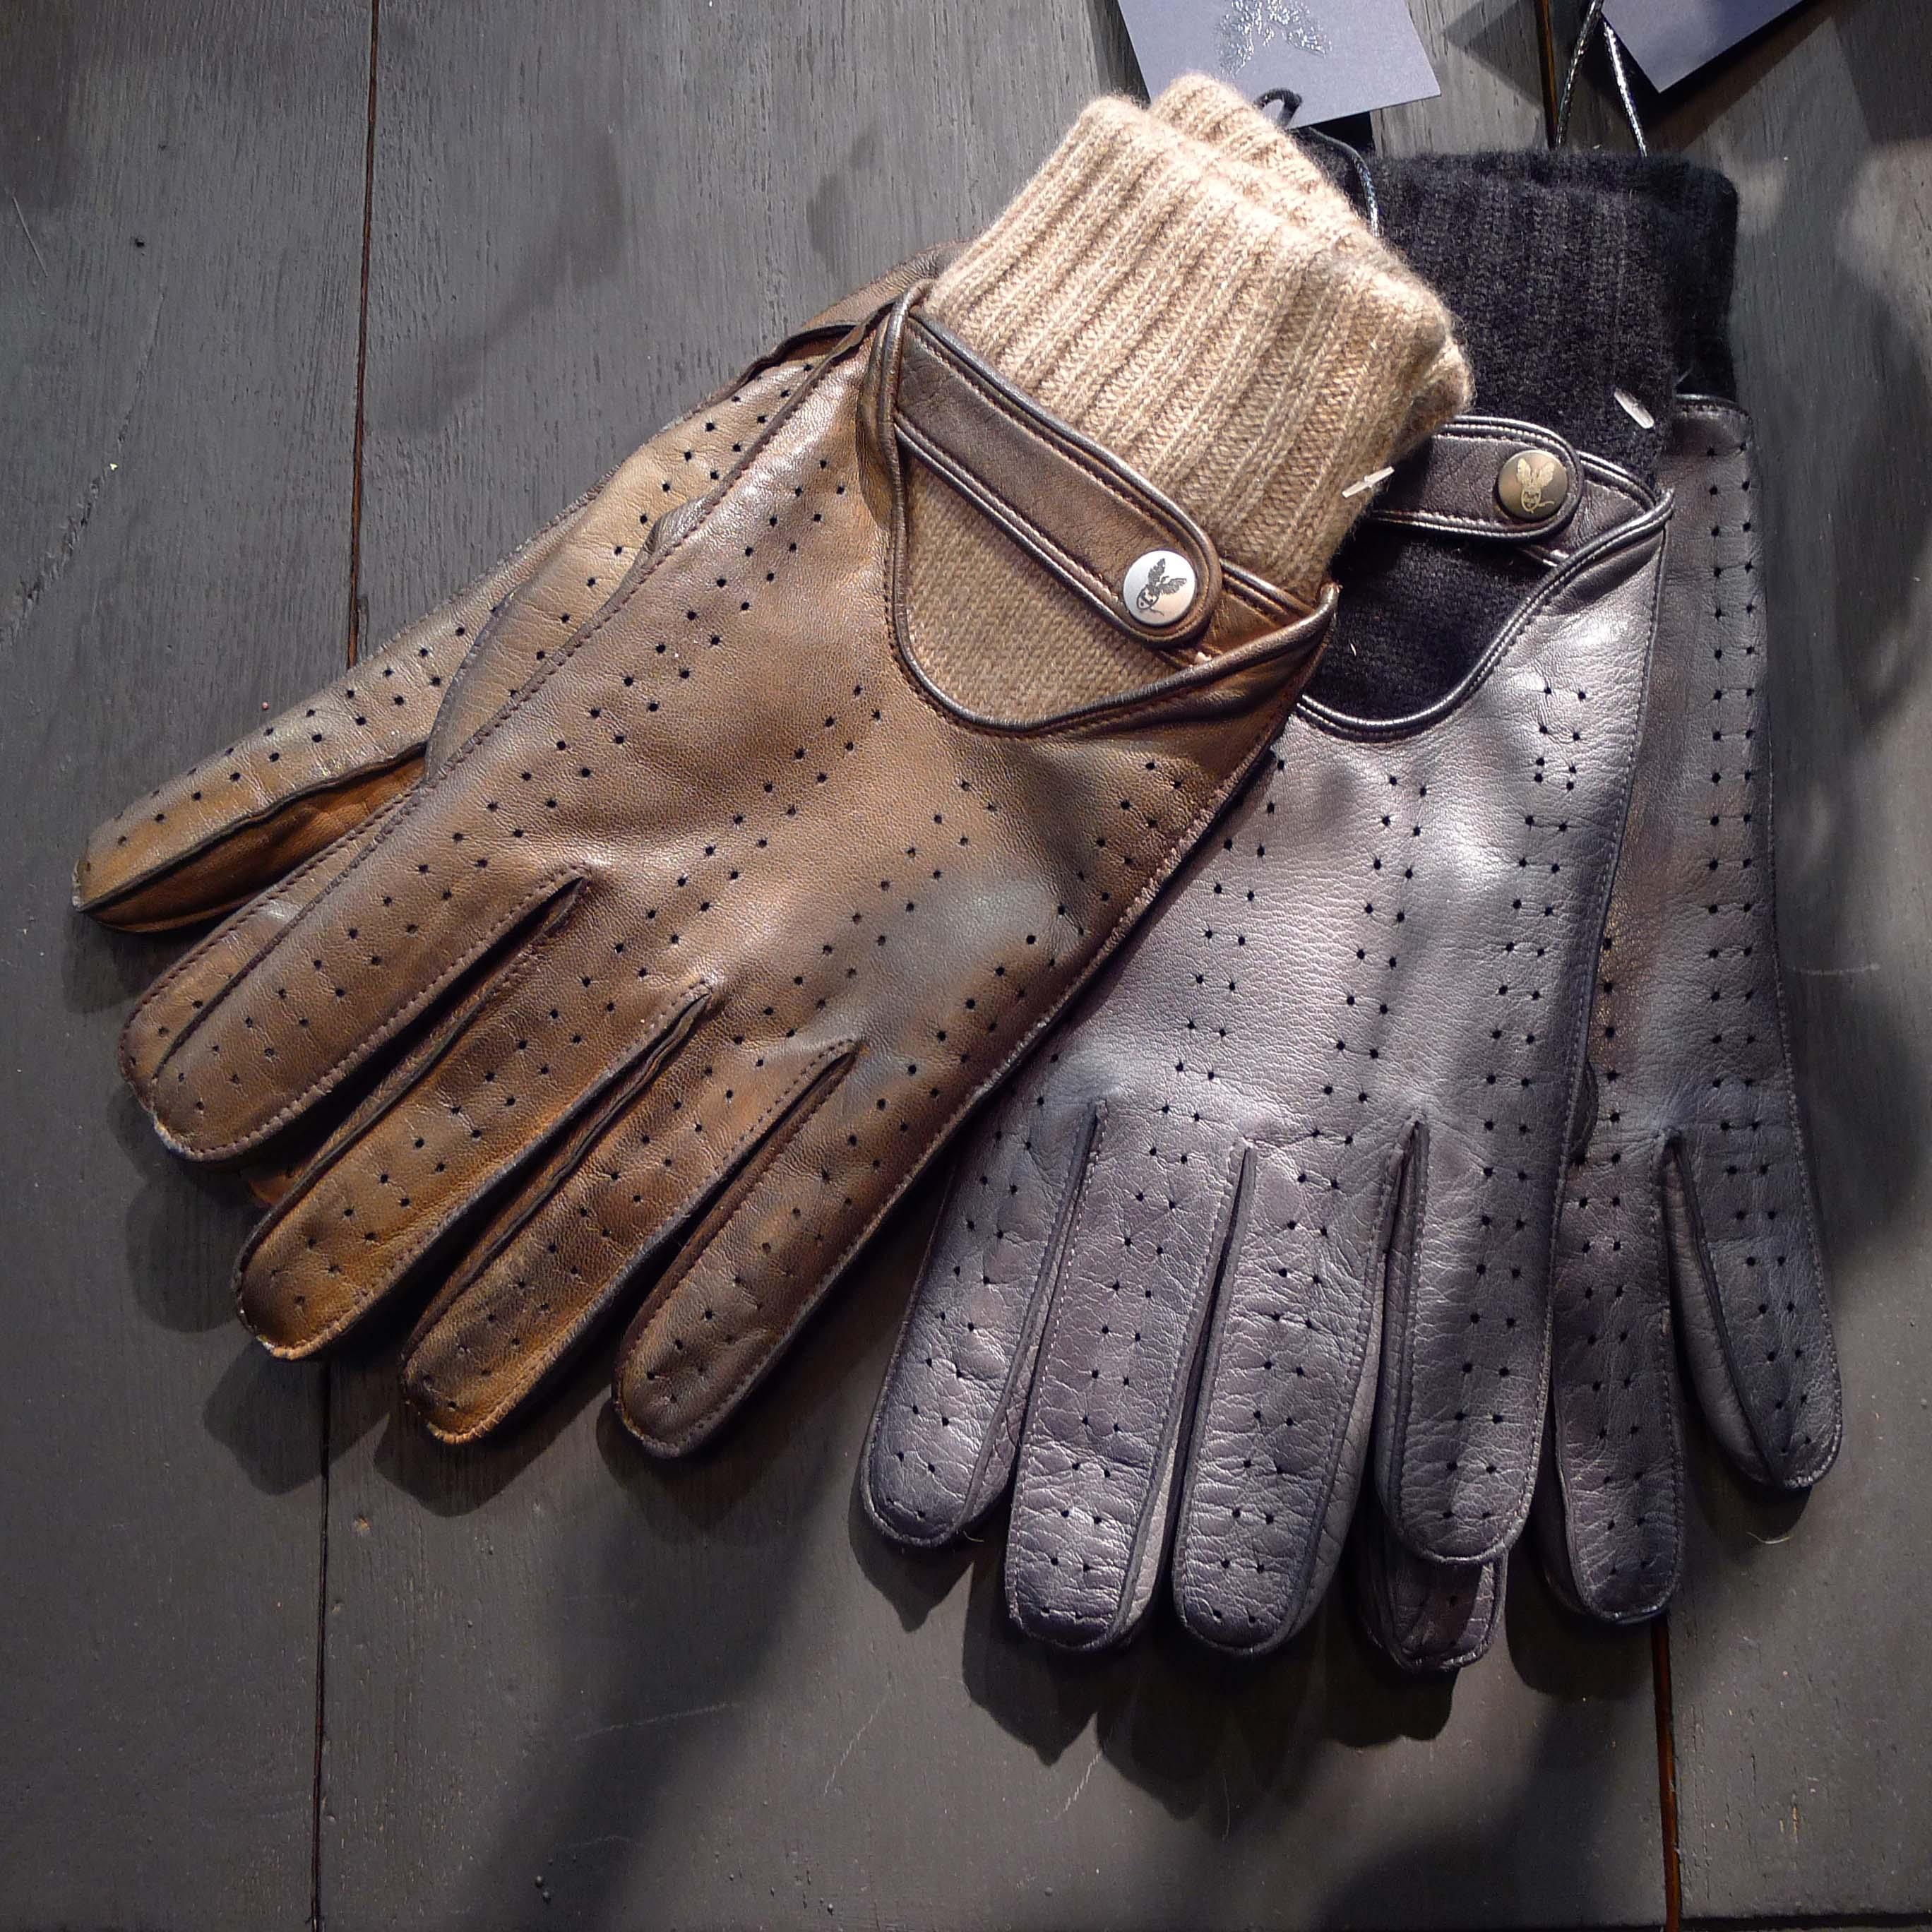 fenwick-handschuhe-01